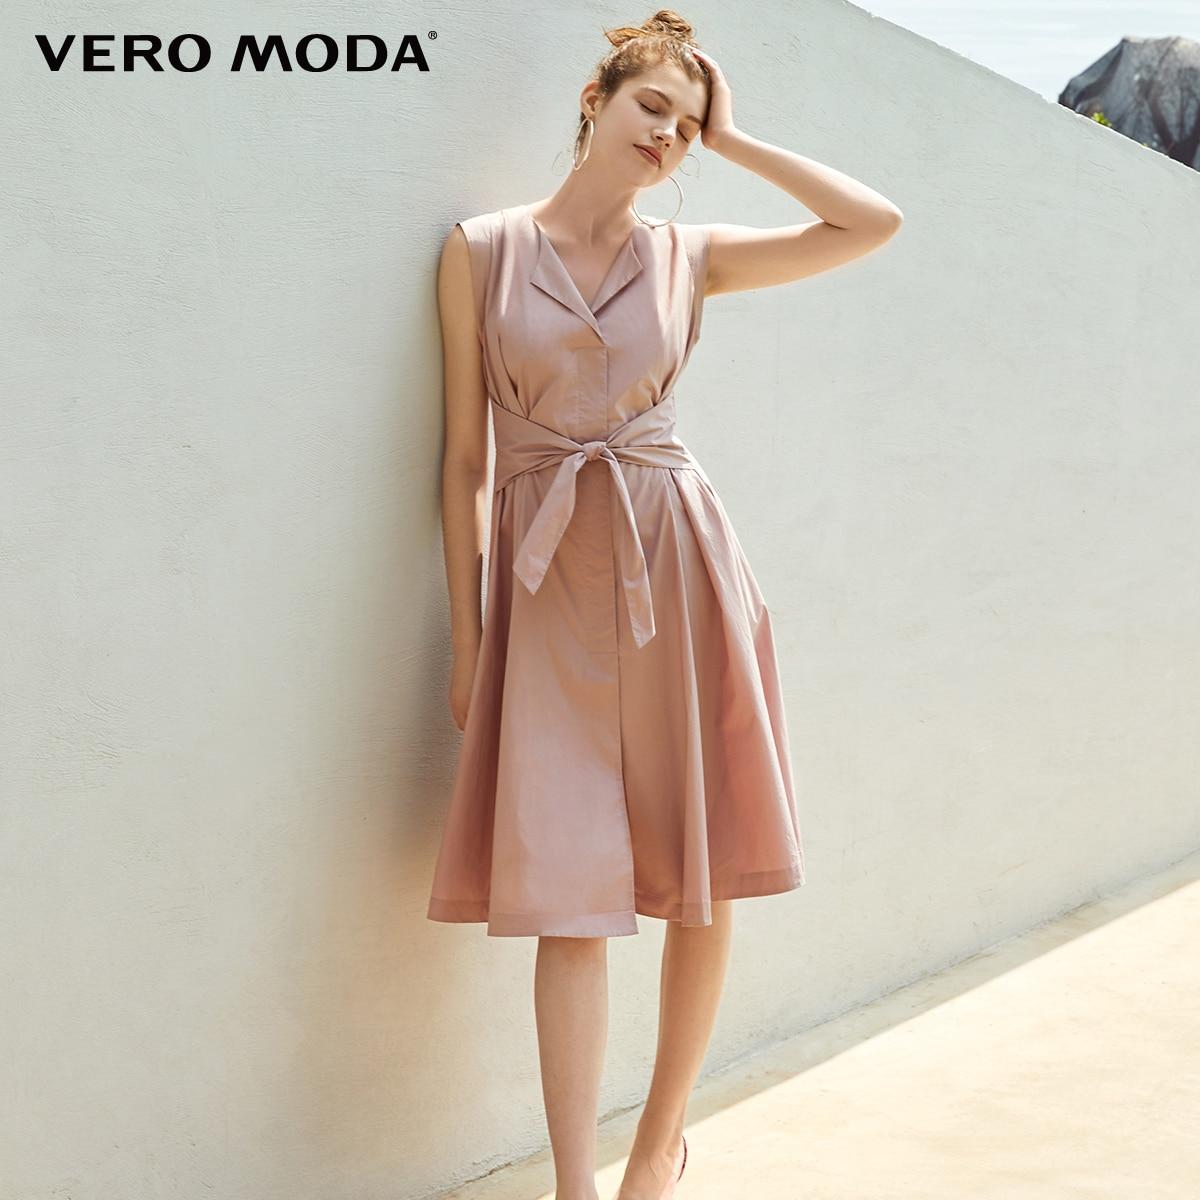 Vero Moda Women's 100% Cotton Lace-up Waist Sleeveless Pure Knee-length Dress | 31927B526